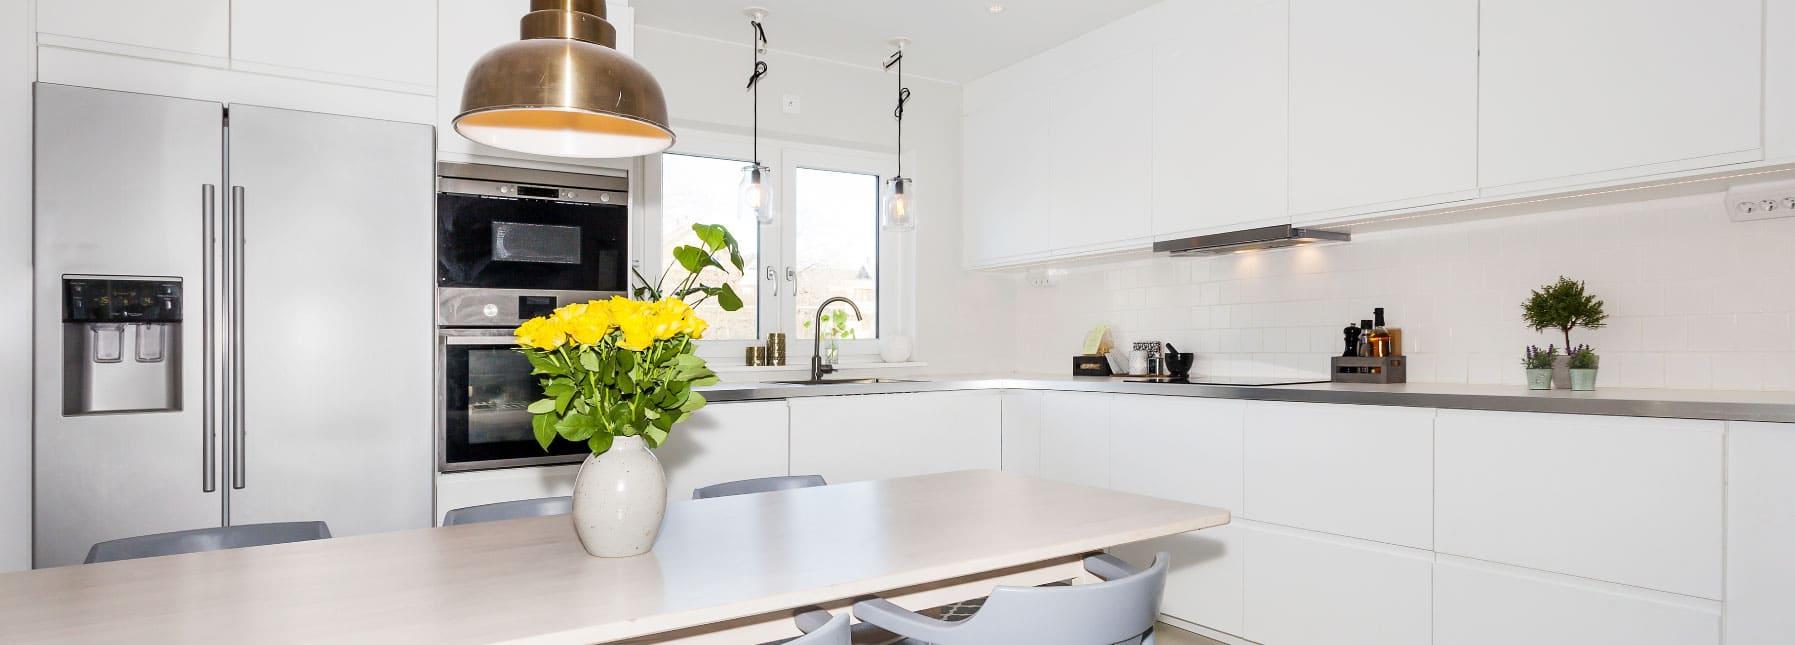 Flat Pack Kitchens & Cabinets Brisbane | Shop Online | Quick Kitchens |